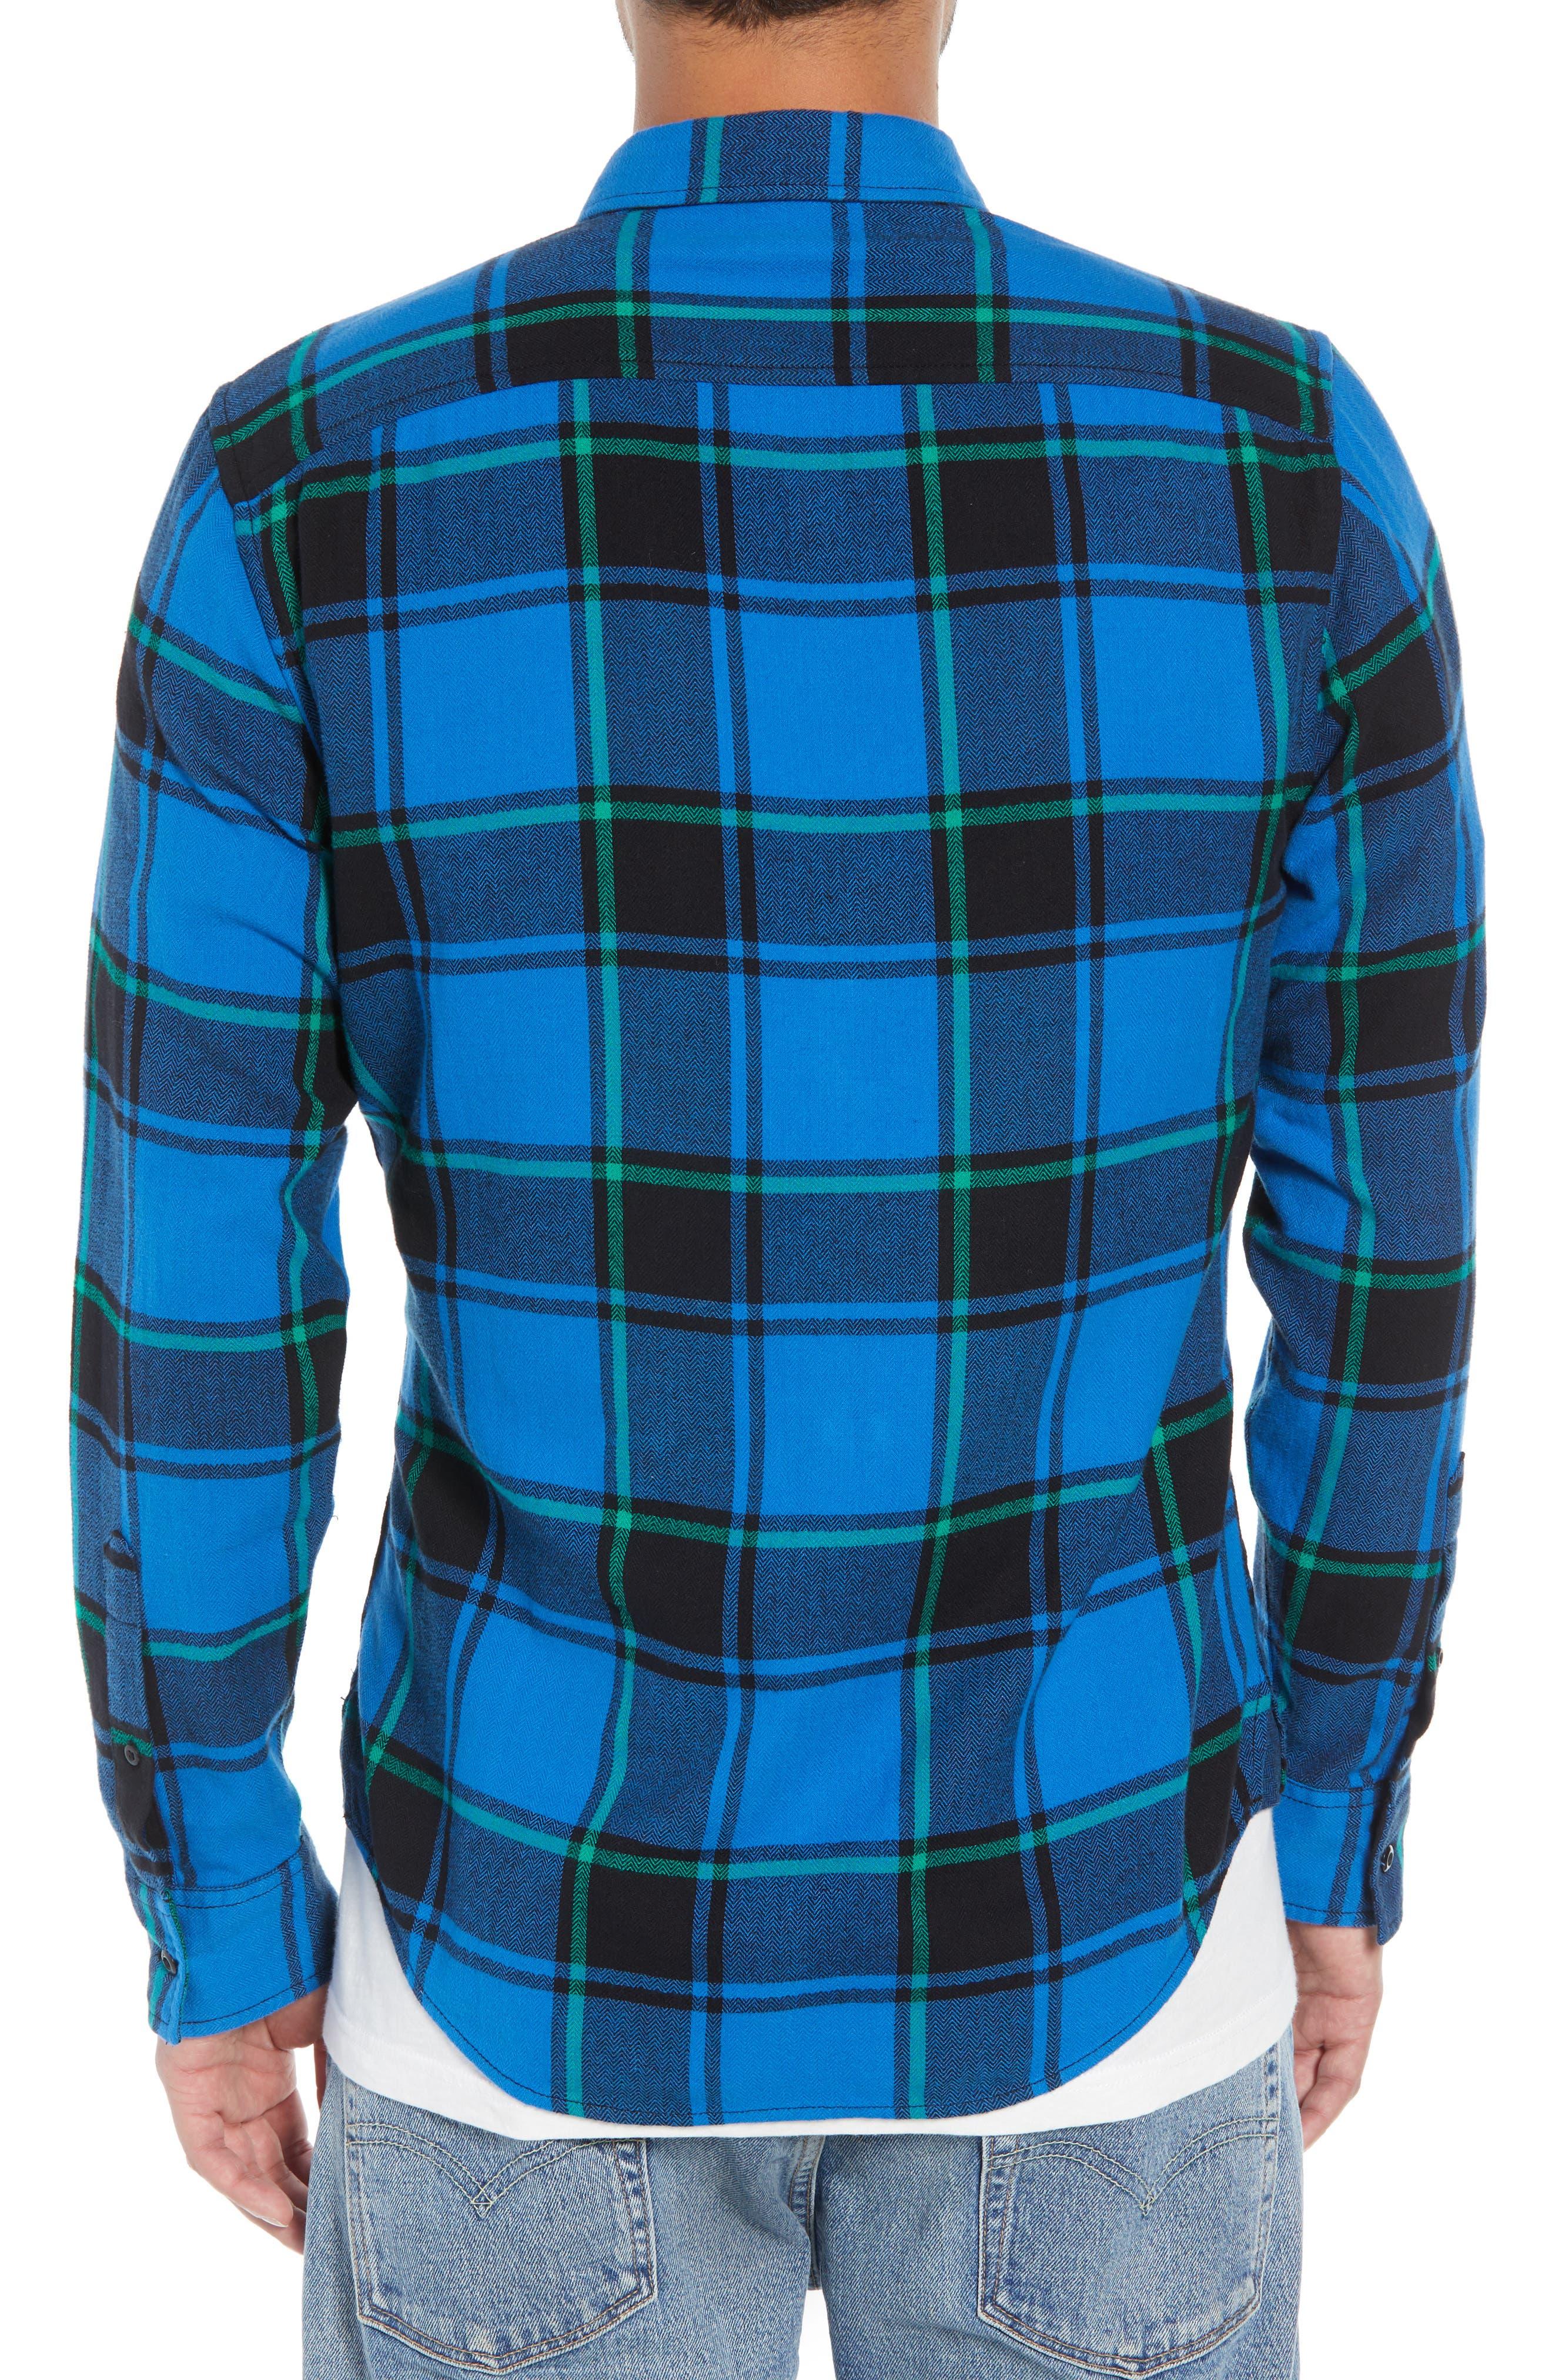 Plaid Flannel Shirt,                             Alternate thumbnail 2, color,                             BLUE BLACK REESE PLAID